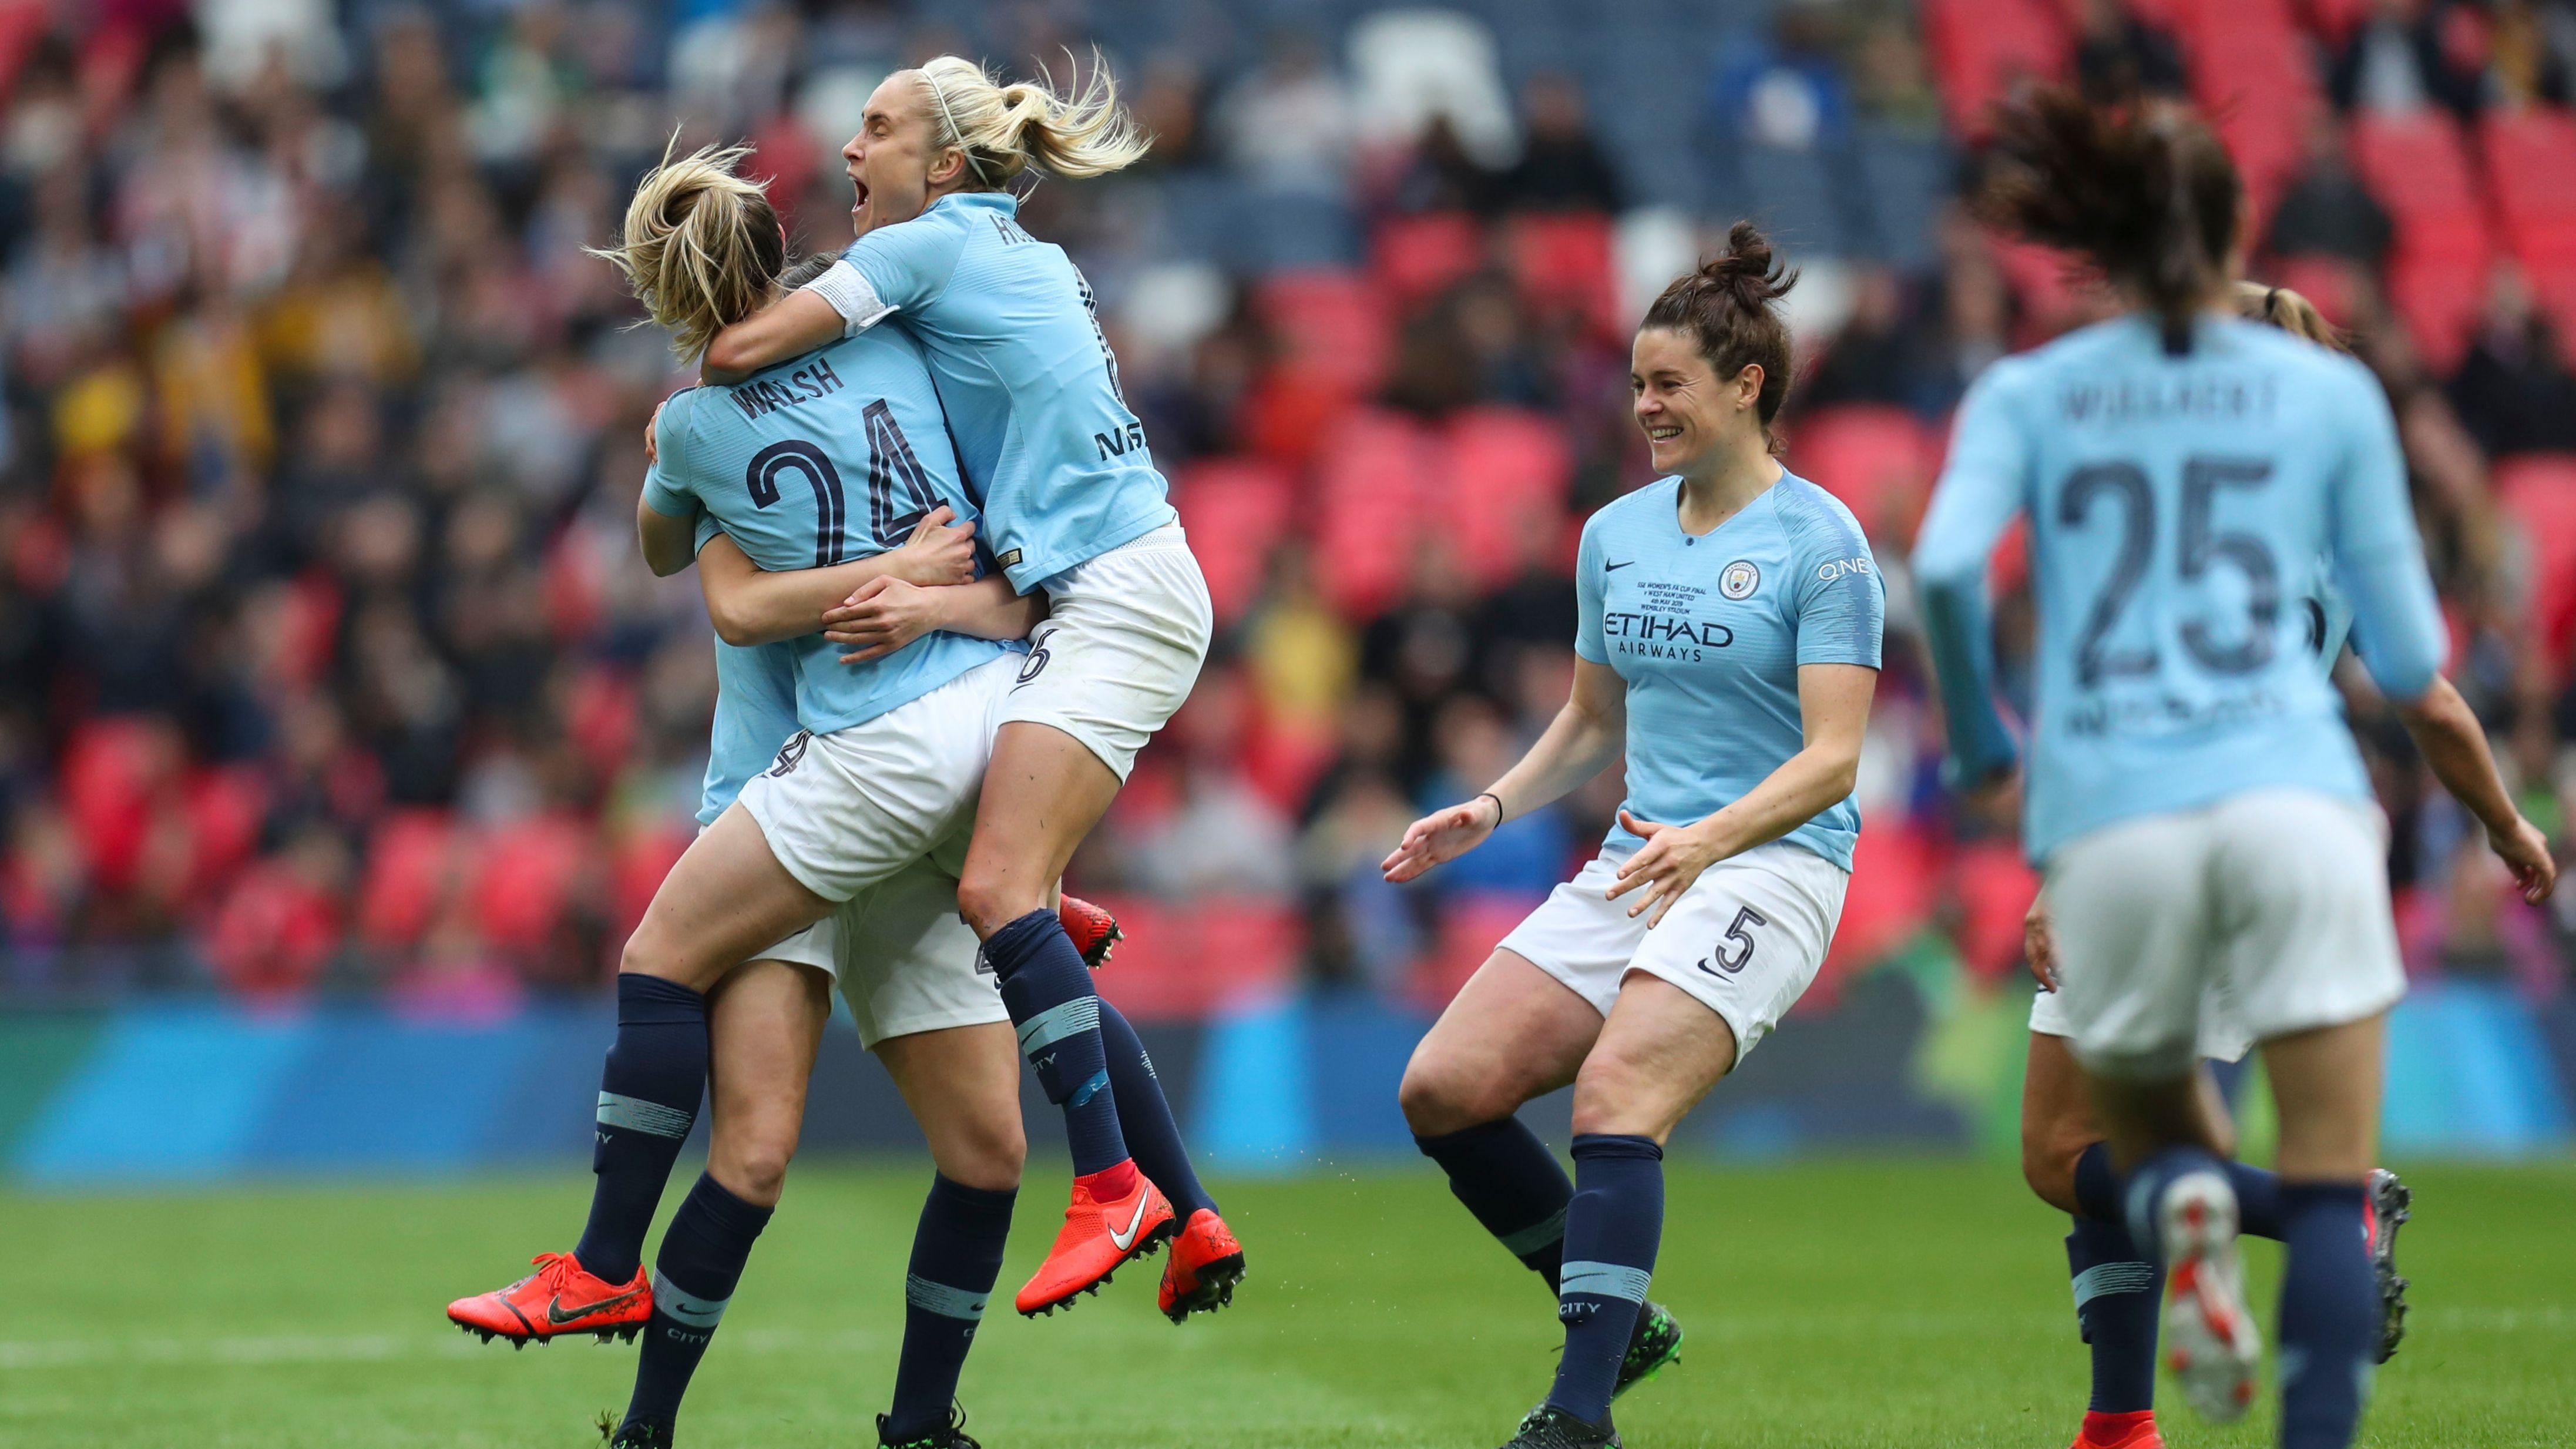 Watch Women's FA Cup final live - Man City v West Ham - Live